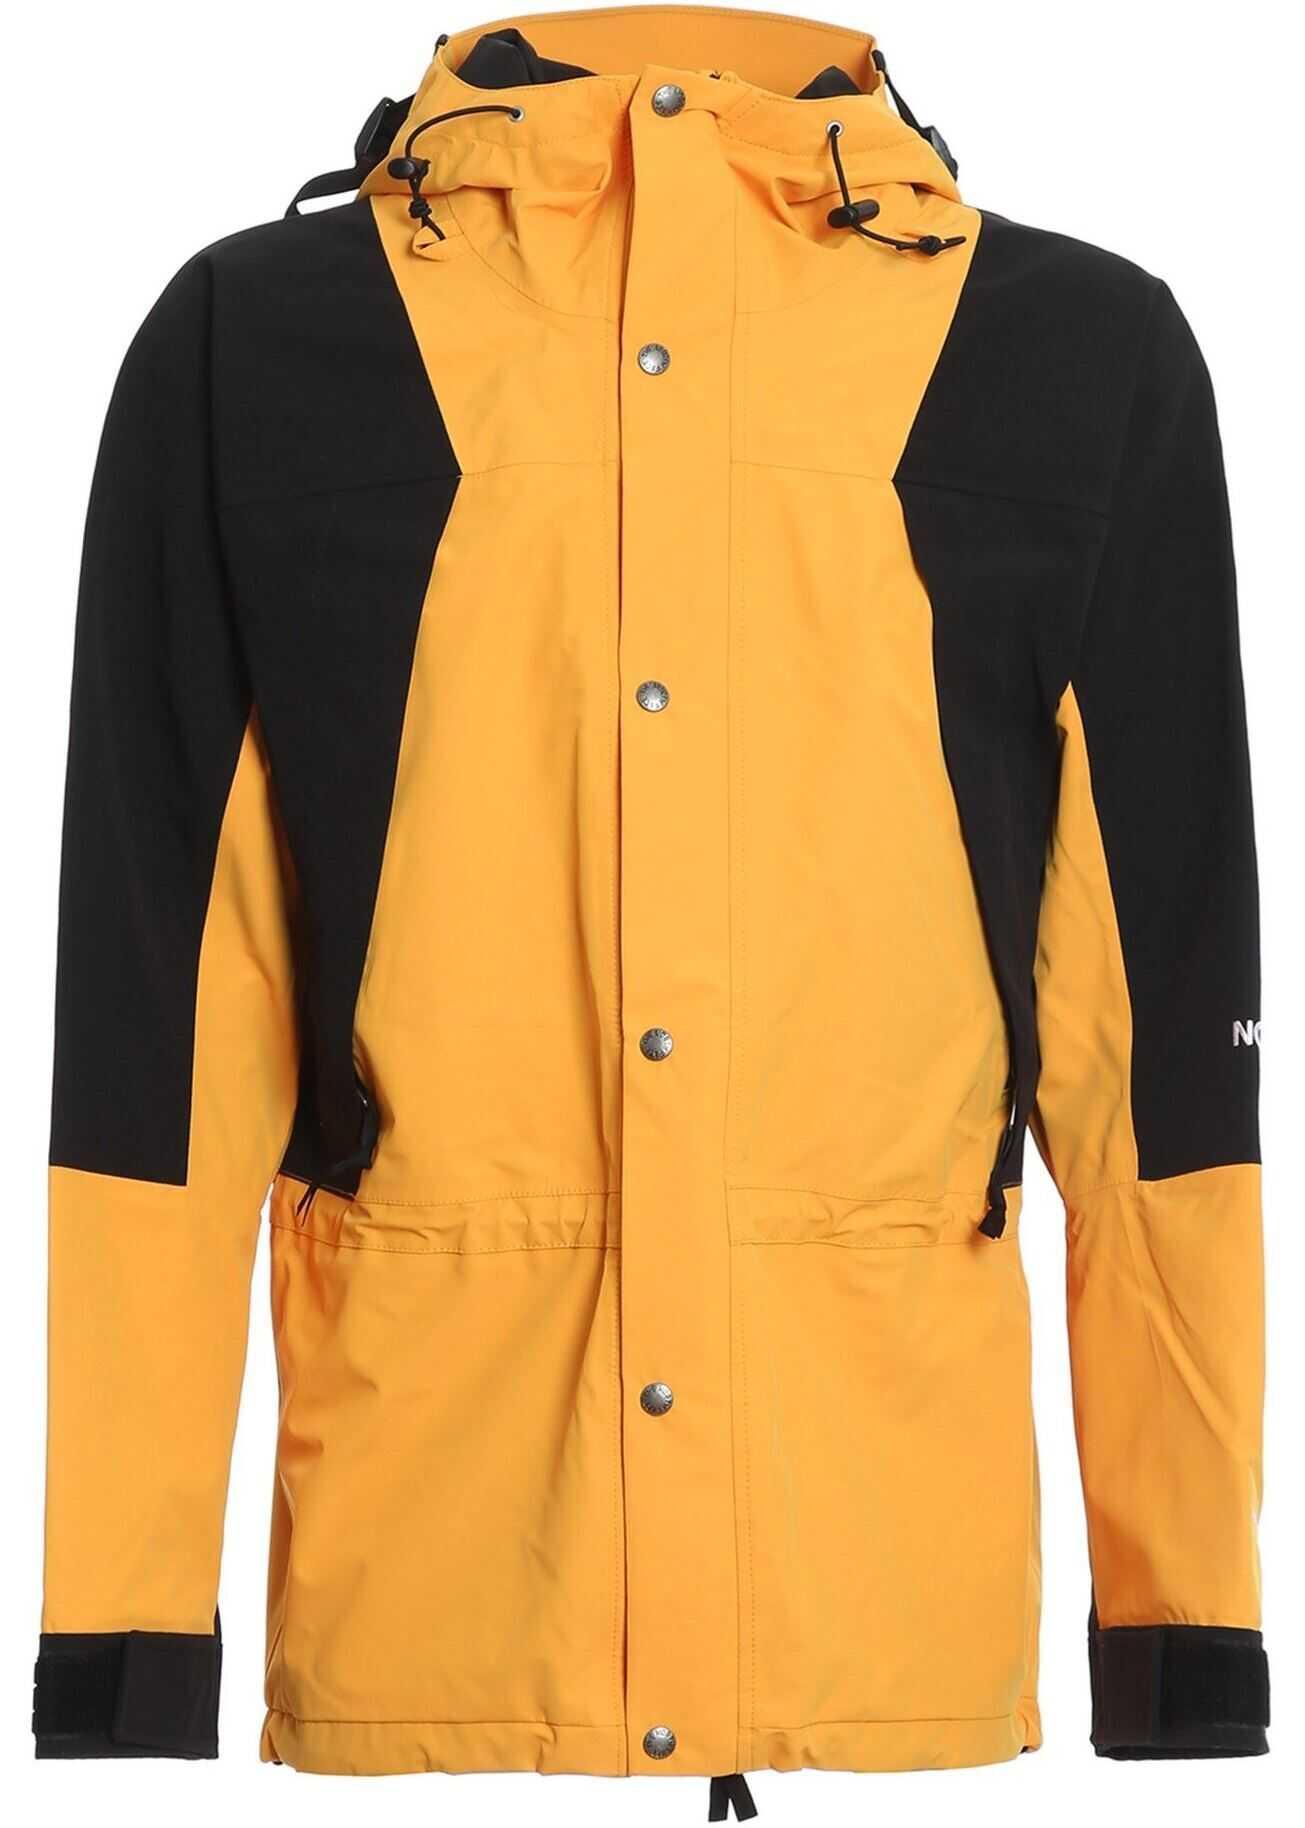 Windproof 1994 Retro Mountain Jacket In Yellow